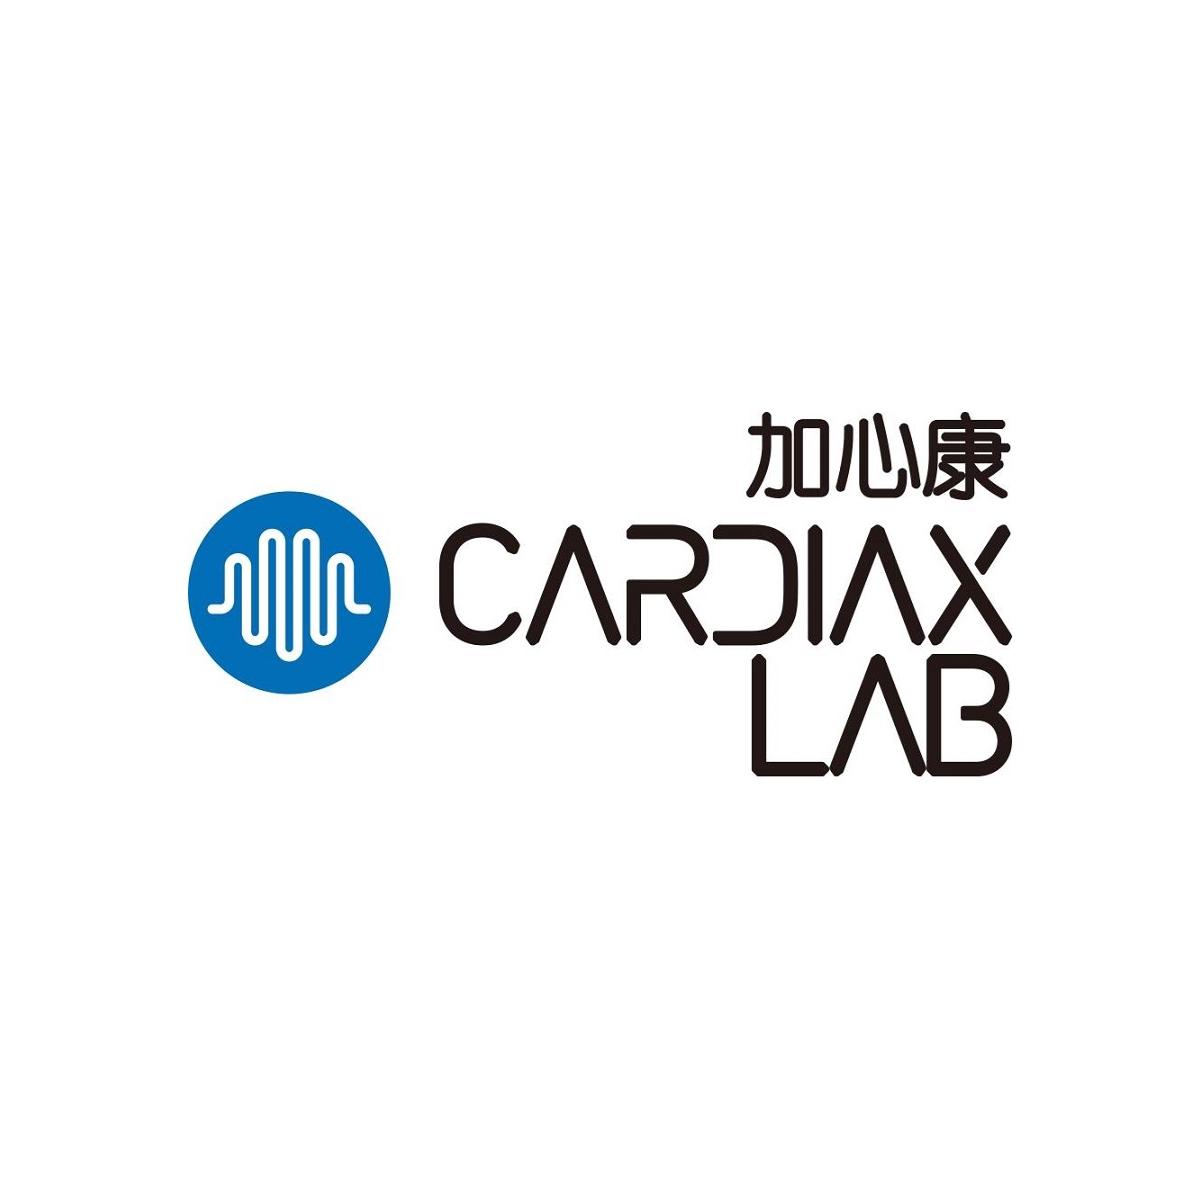 Logo: 加心康